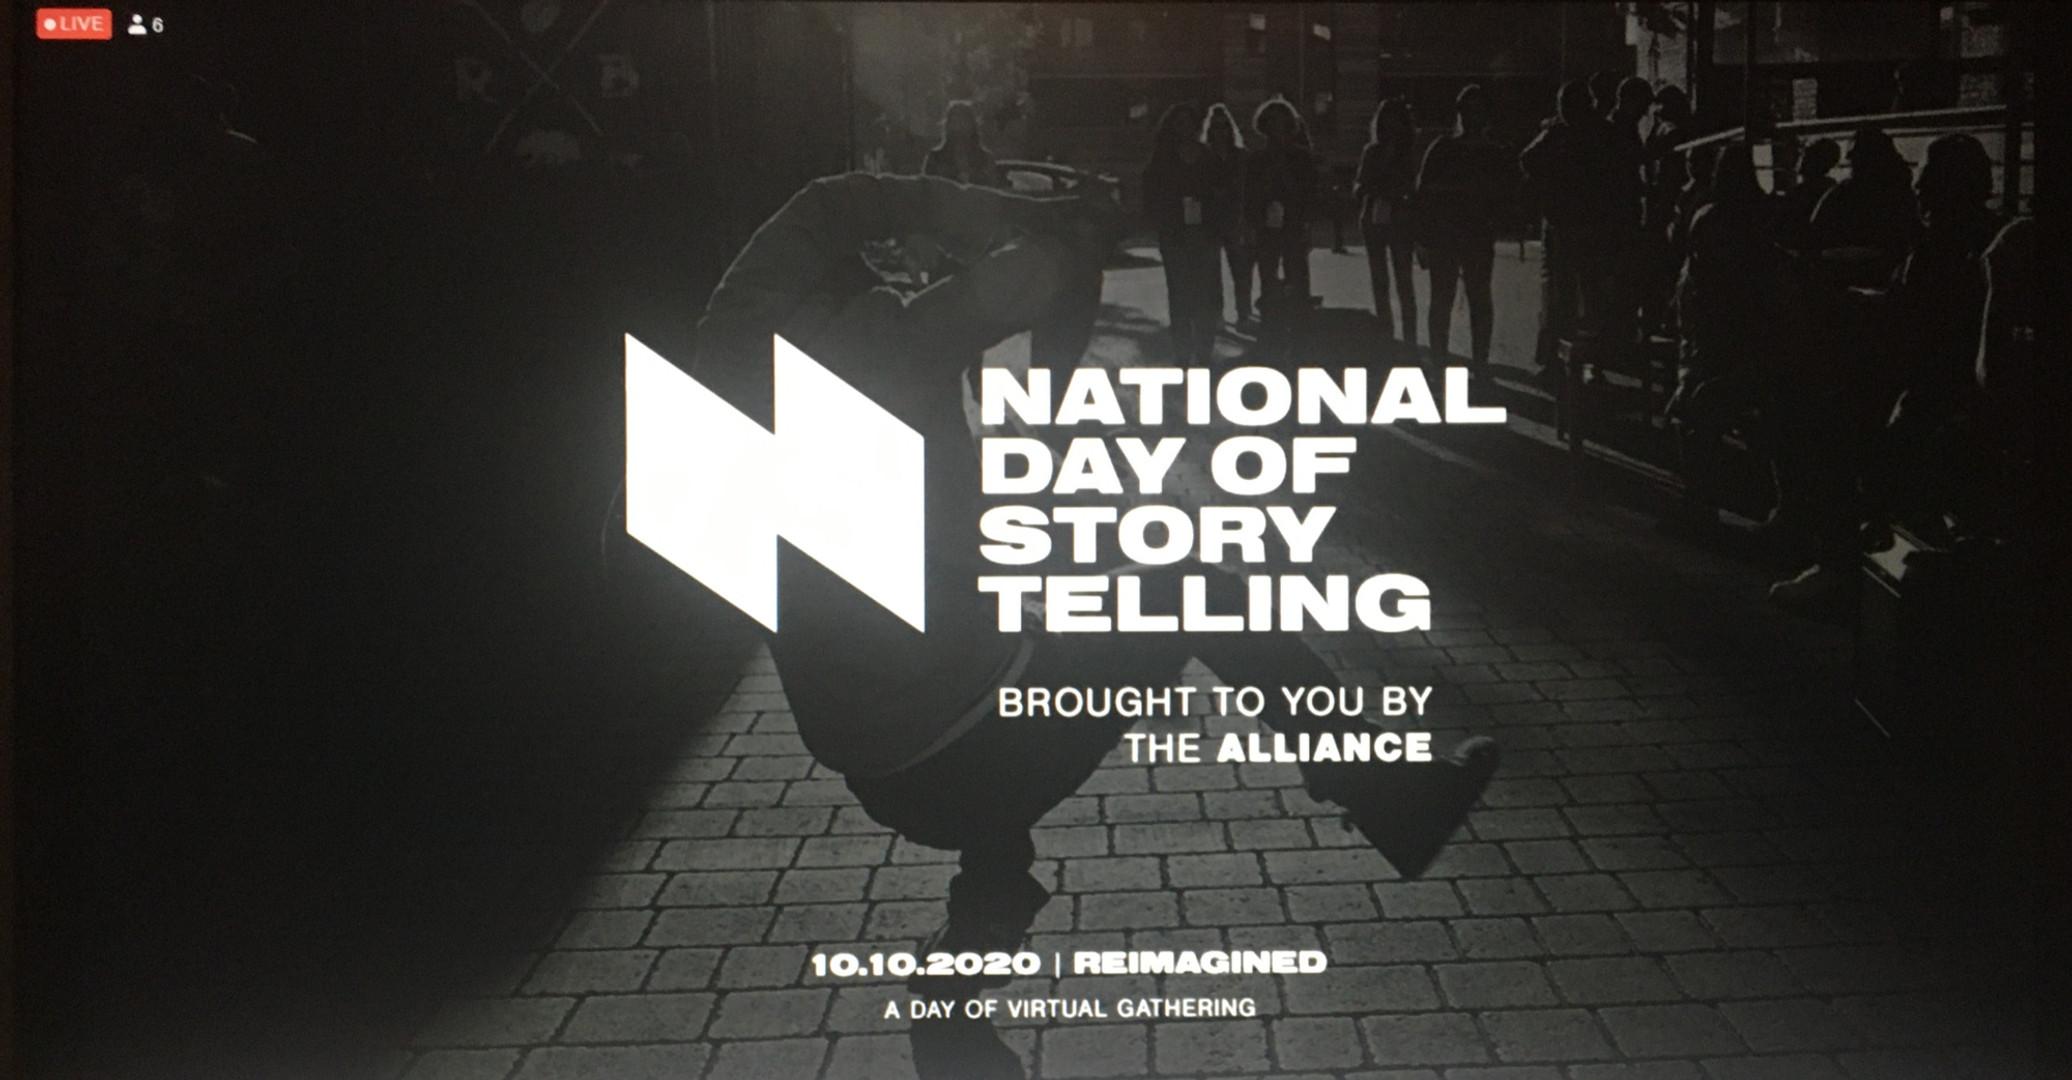 National Day of Storytelling